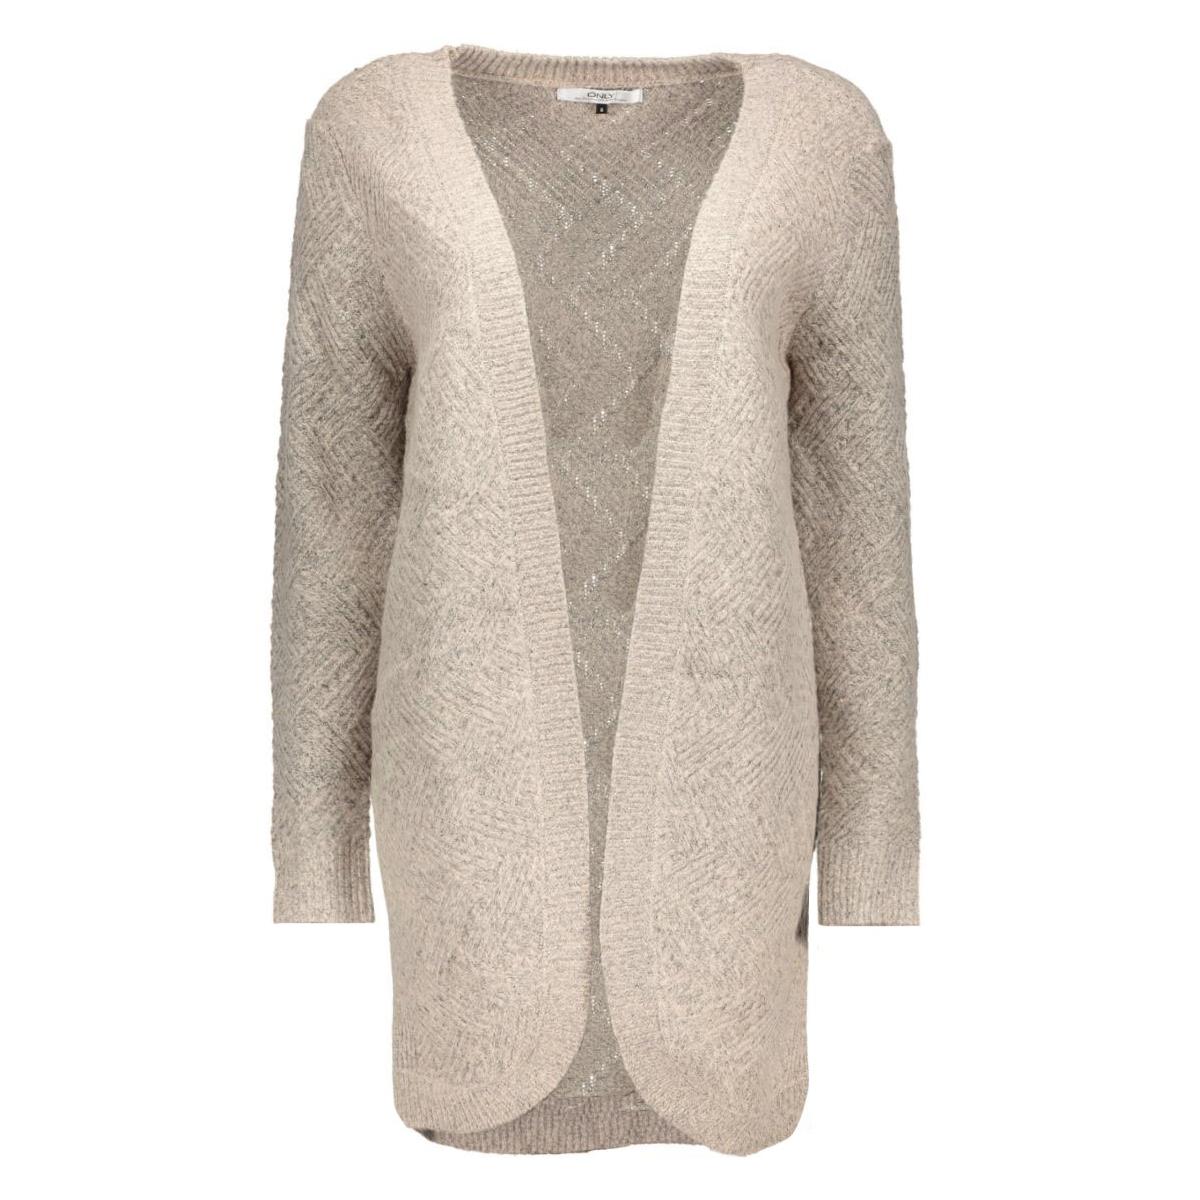 onlbretagne l/s open cardigan knt noos 15120119 only vest pumice stone/w melange